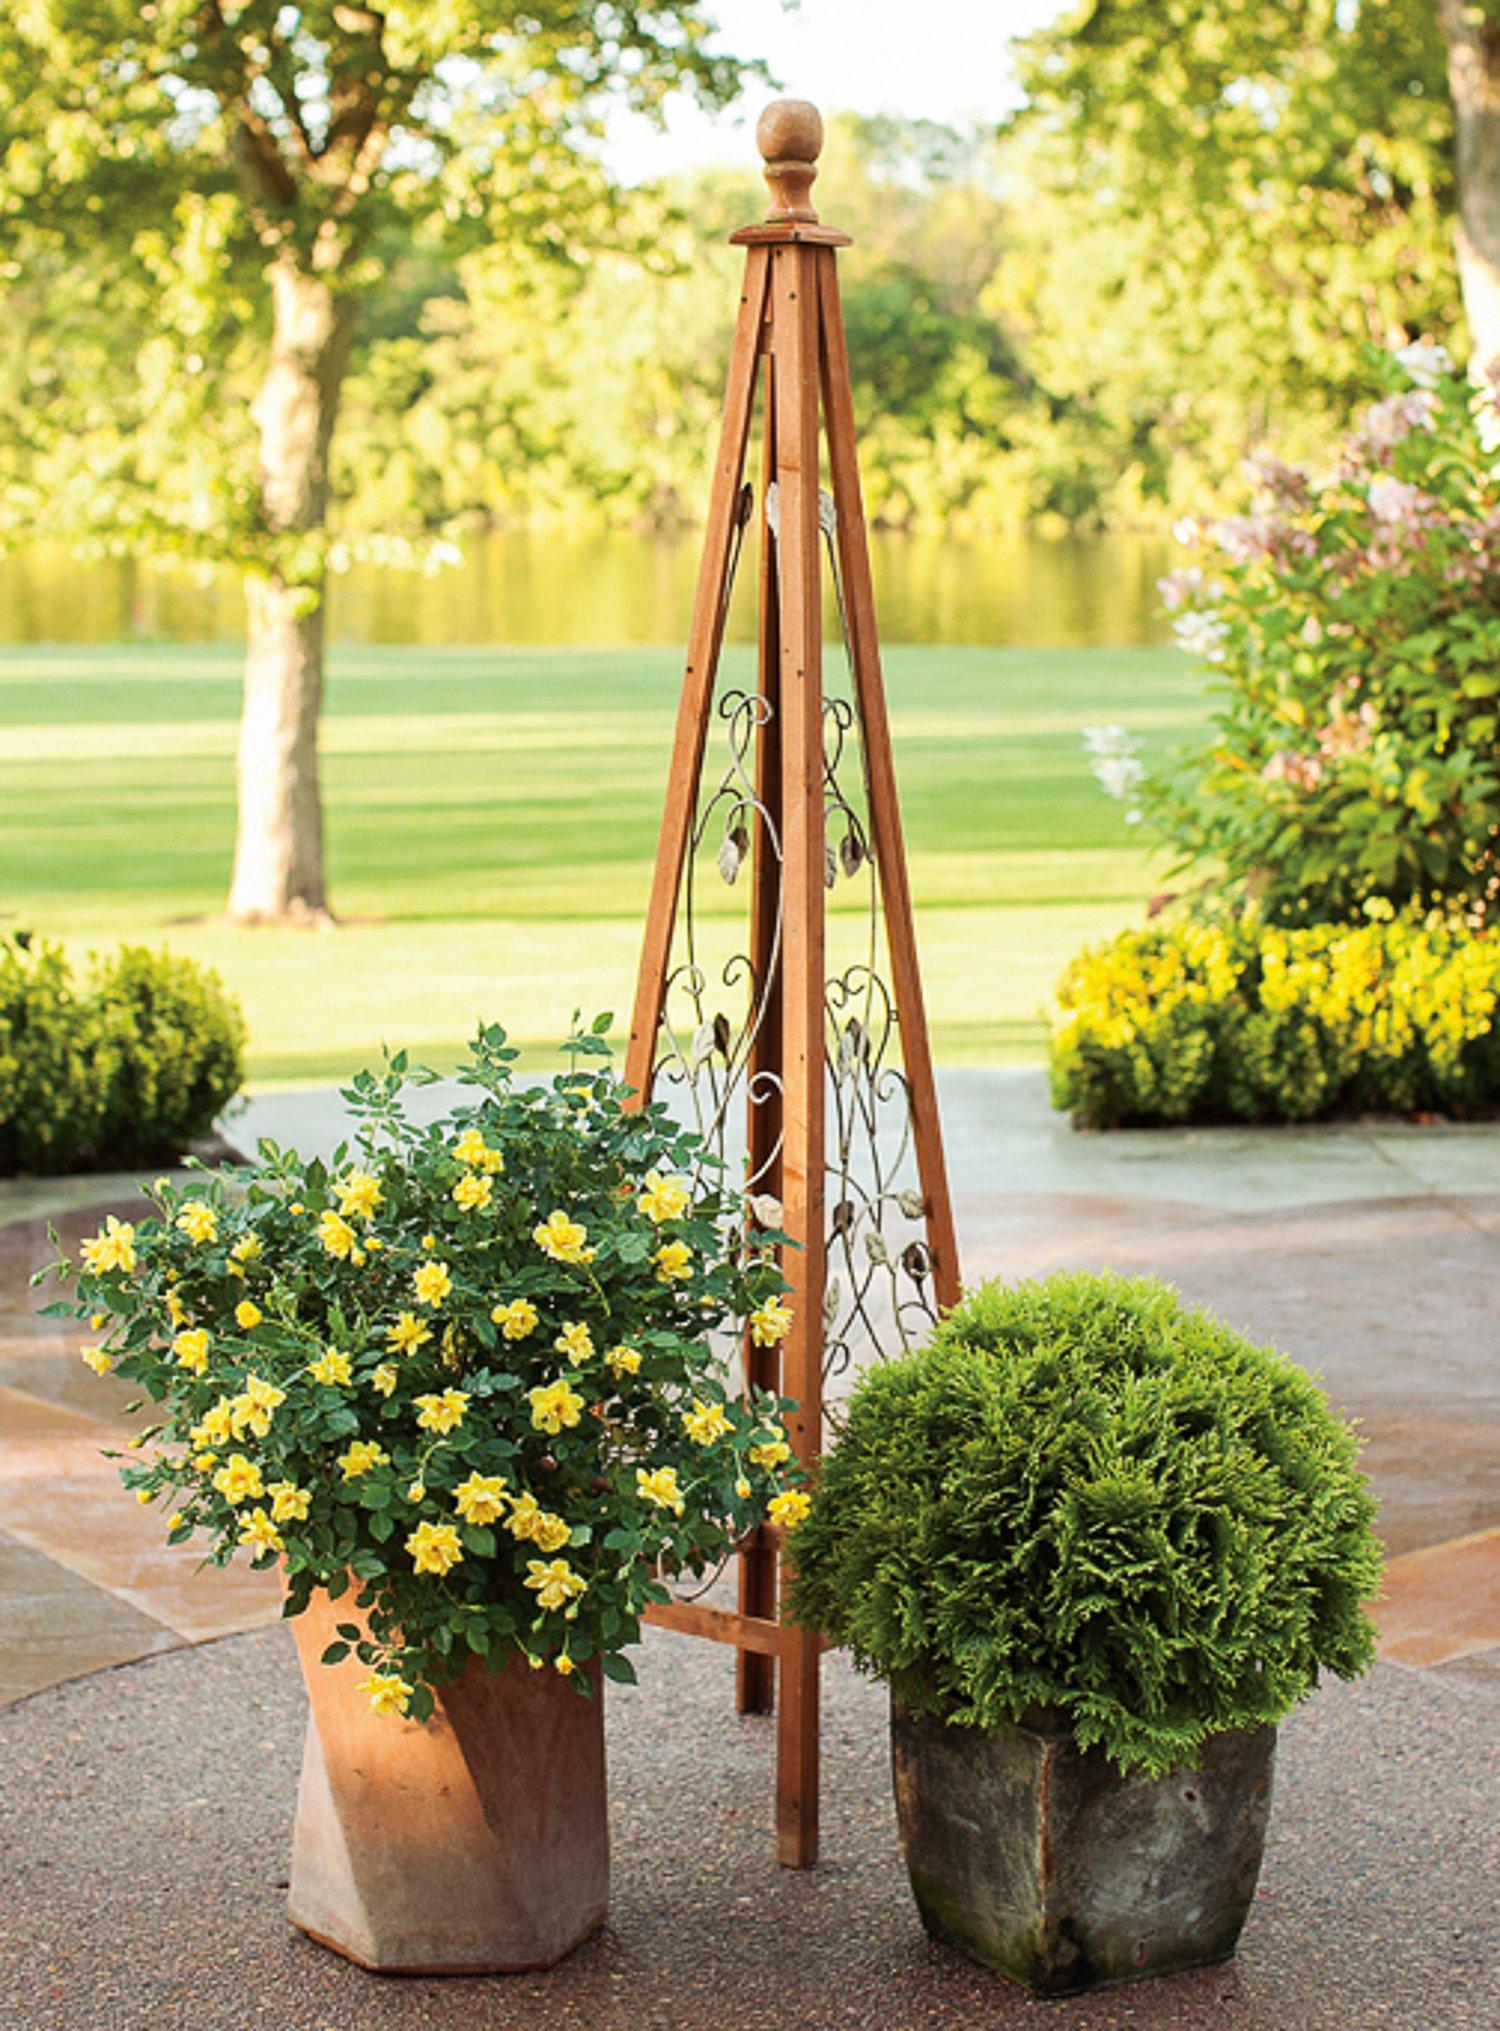 3 Gal. Oso Easy Lemon Zest Landscape Rose (Rosa) Live Shrub, Yellow Flowers by Proven Winners (Image #7)